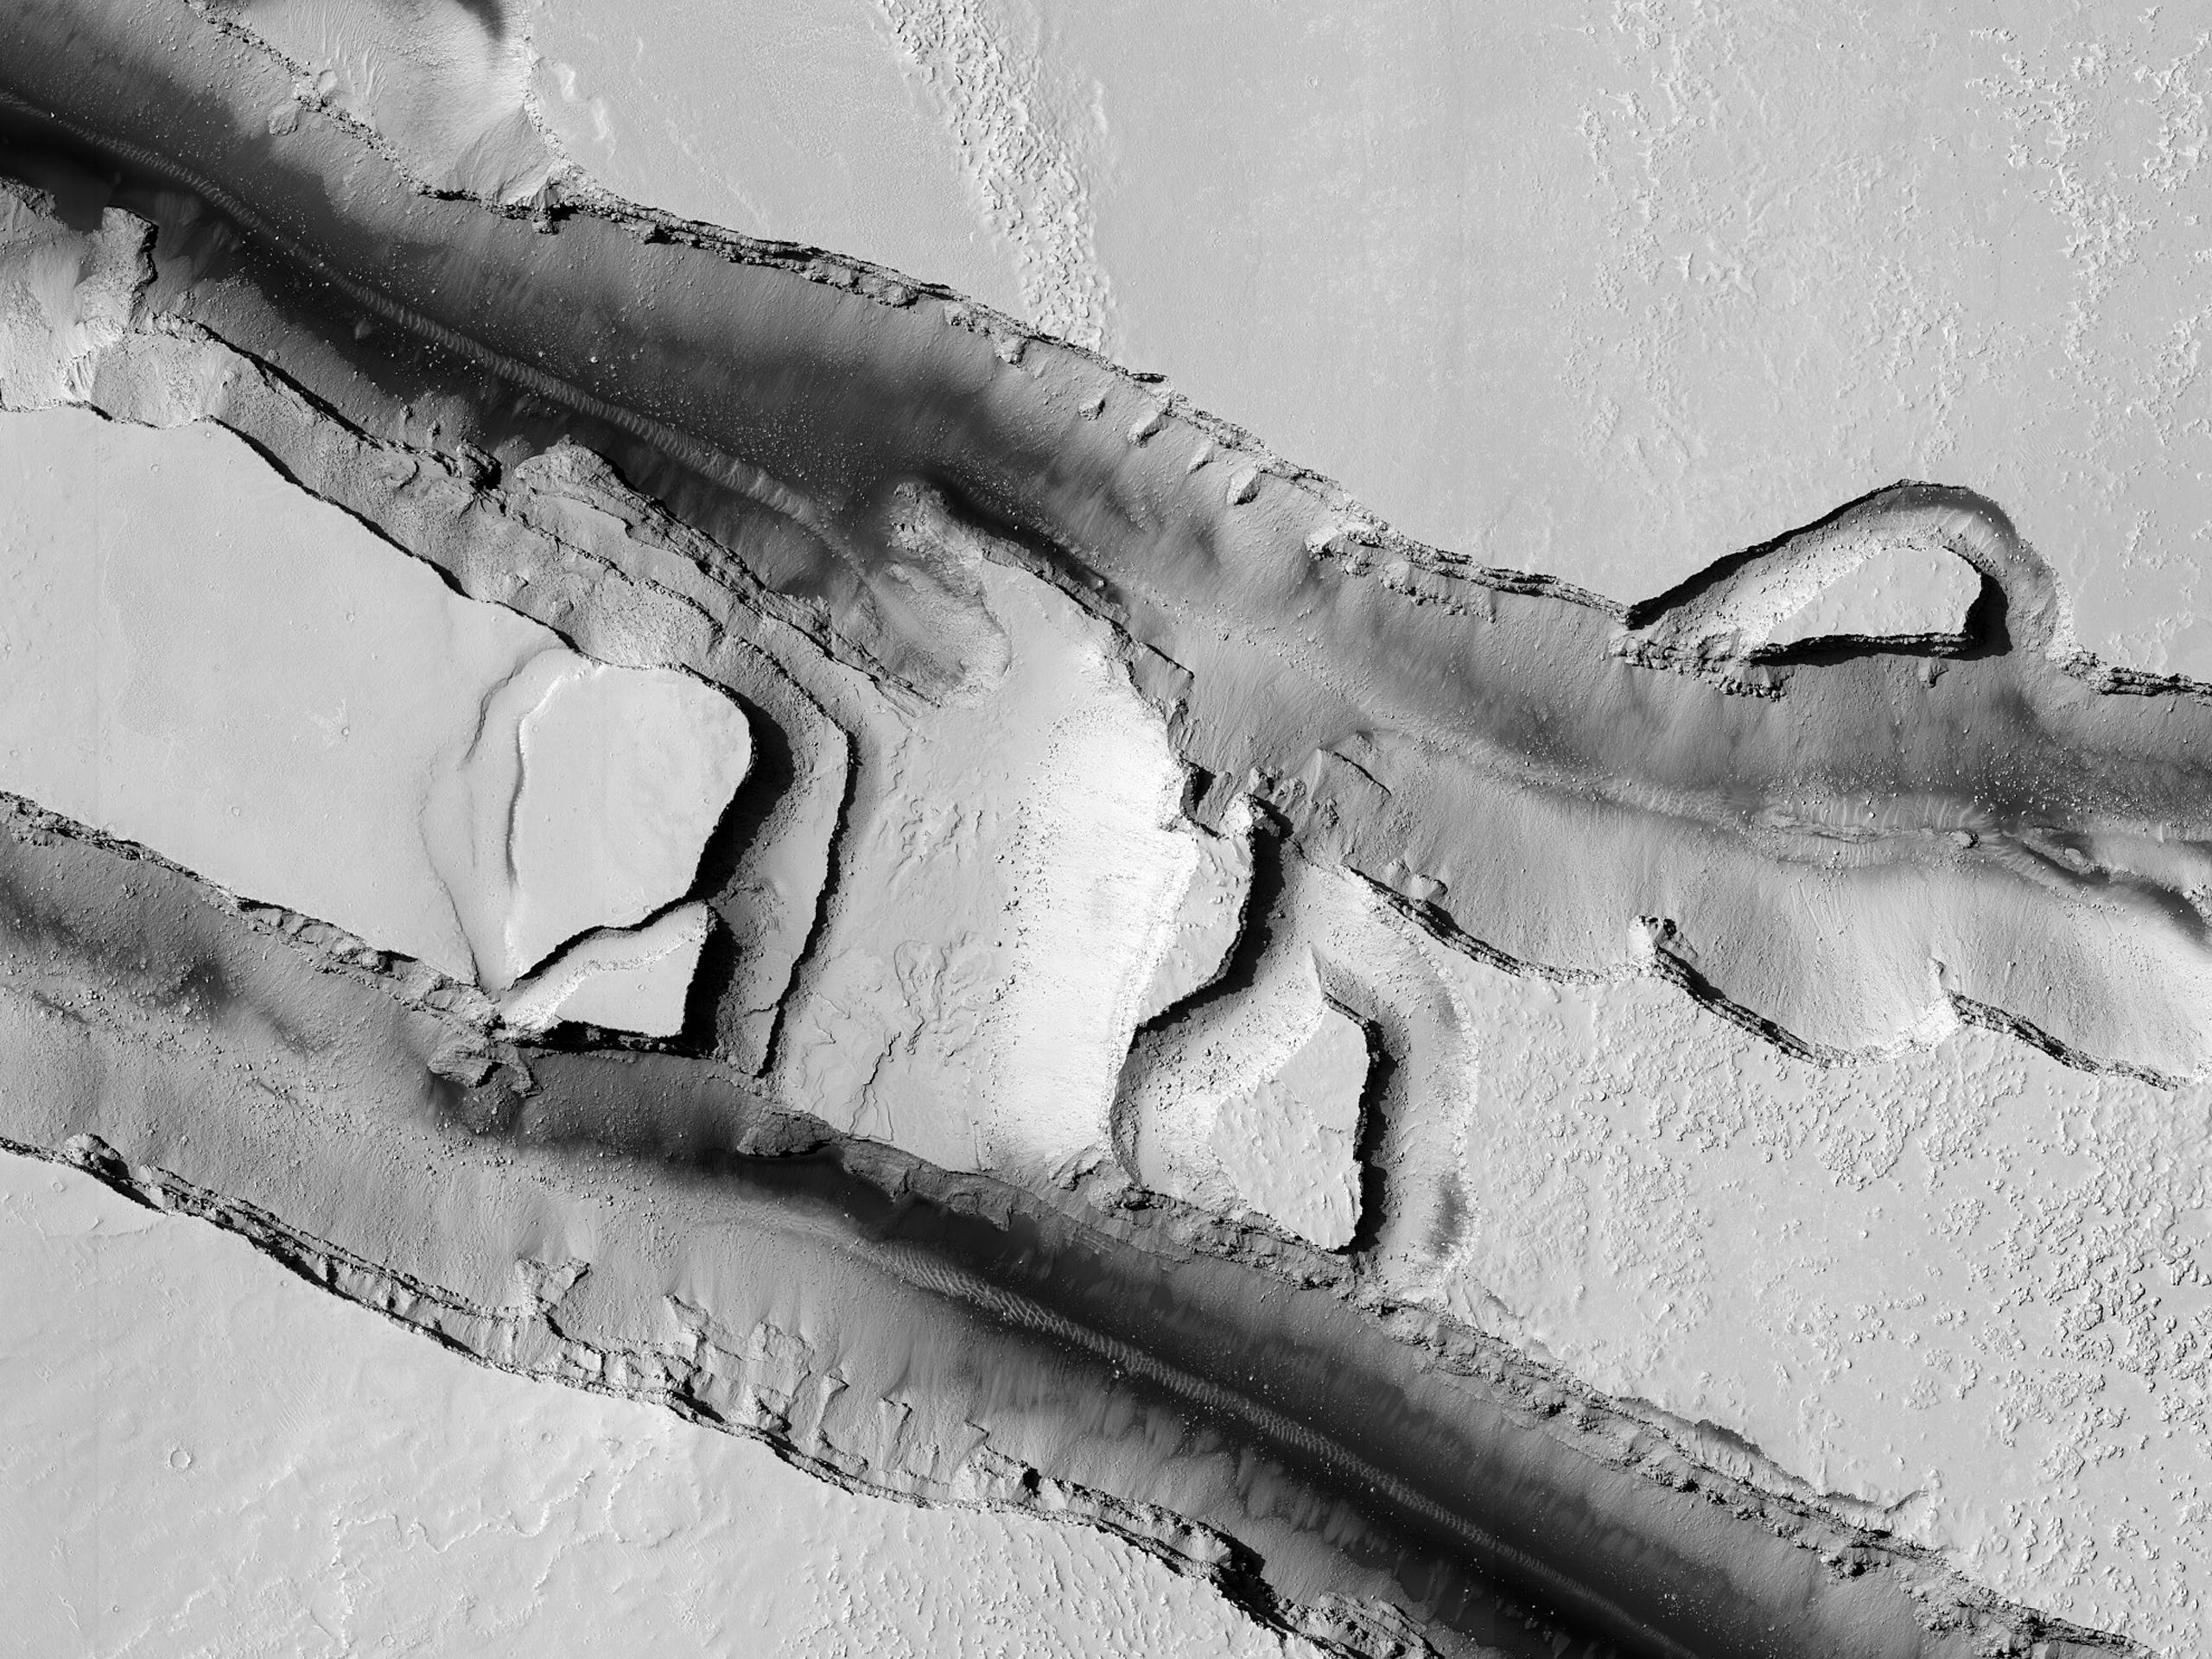 Erosion within Cerberus Fossae